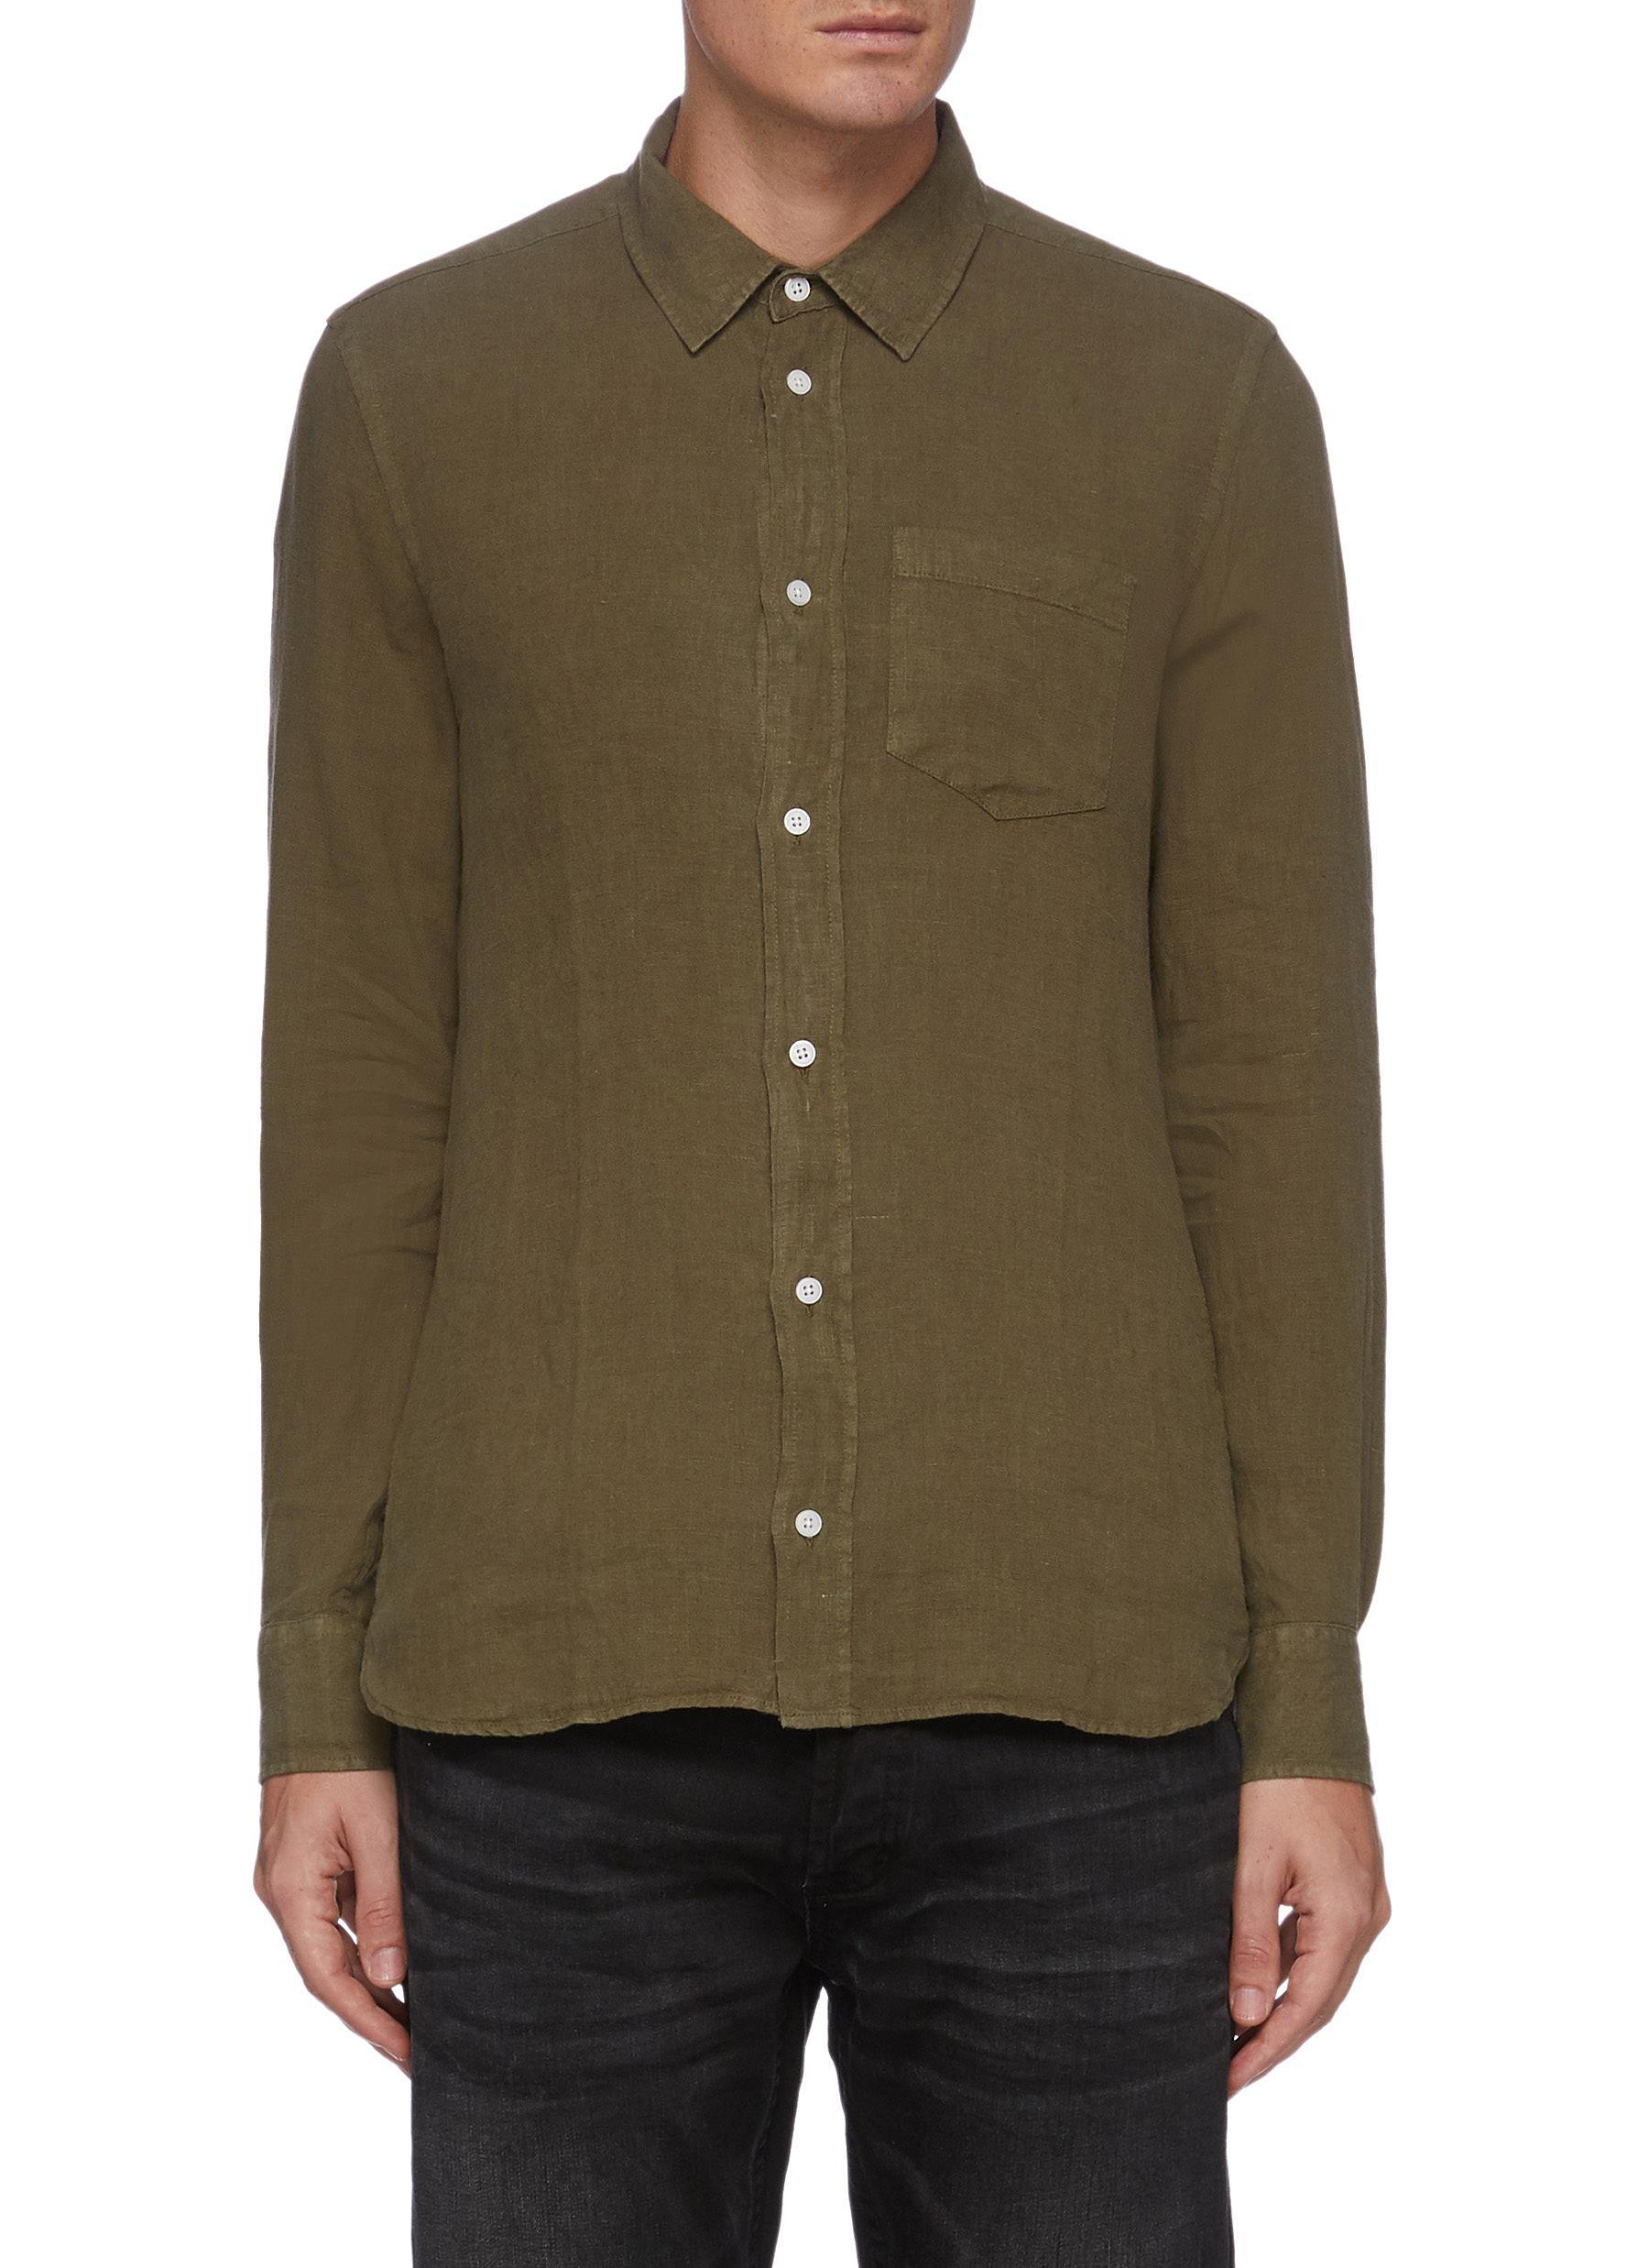 'Harrison' Patch Pocket Linen Shirt